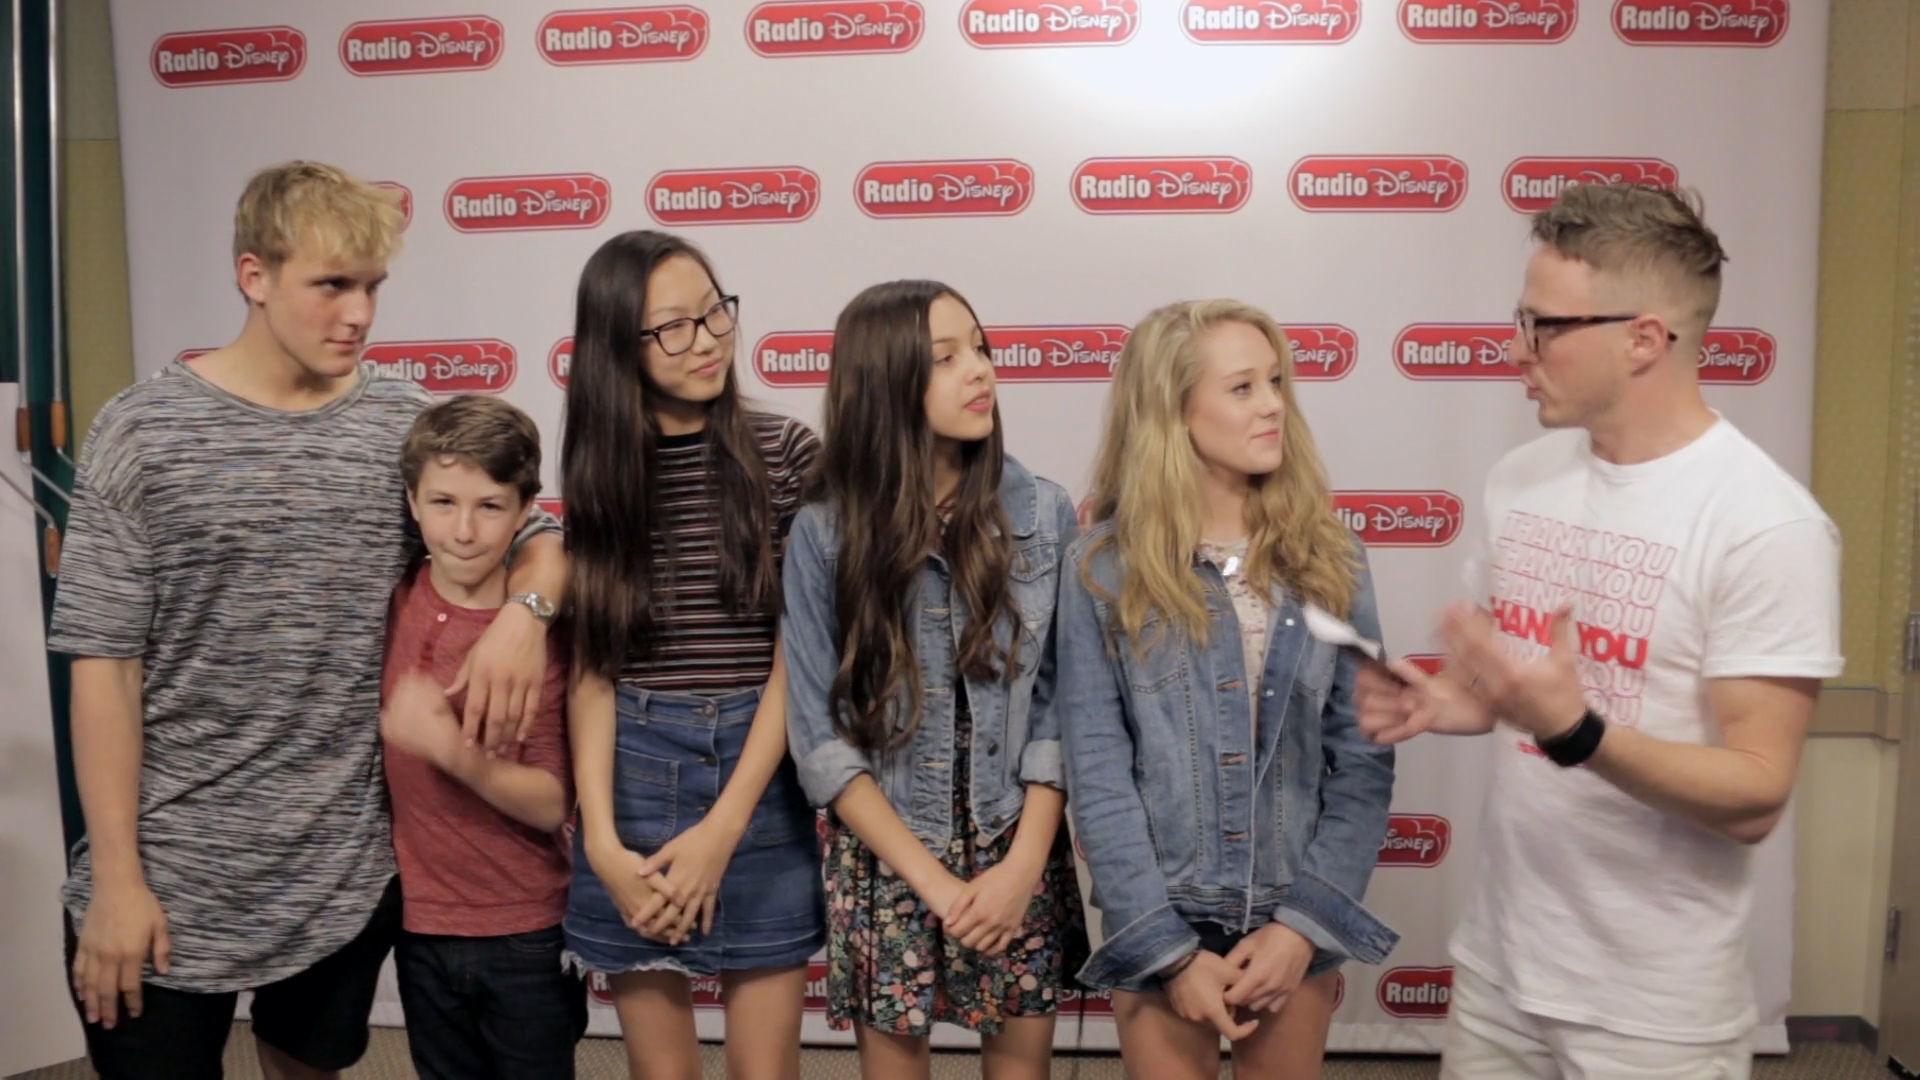 Bizaardvark Cast - Bizarre and Aardvark Trivia Challenge | Radio Disney